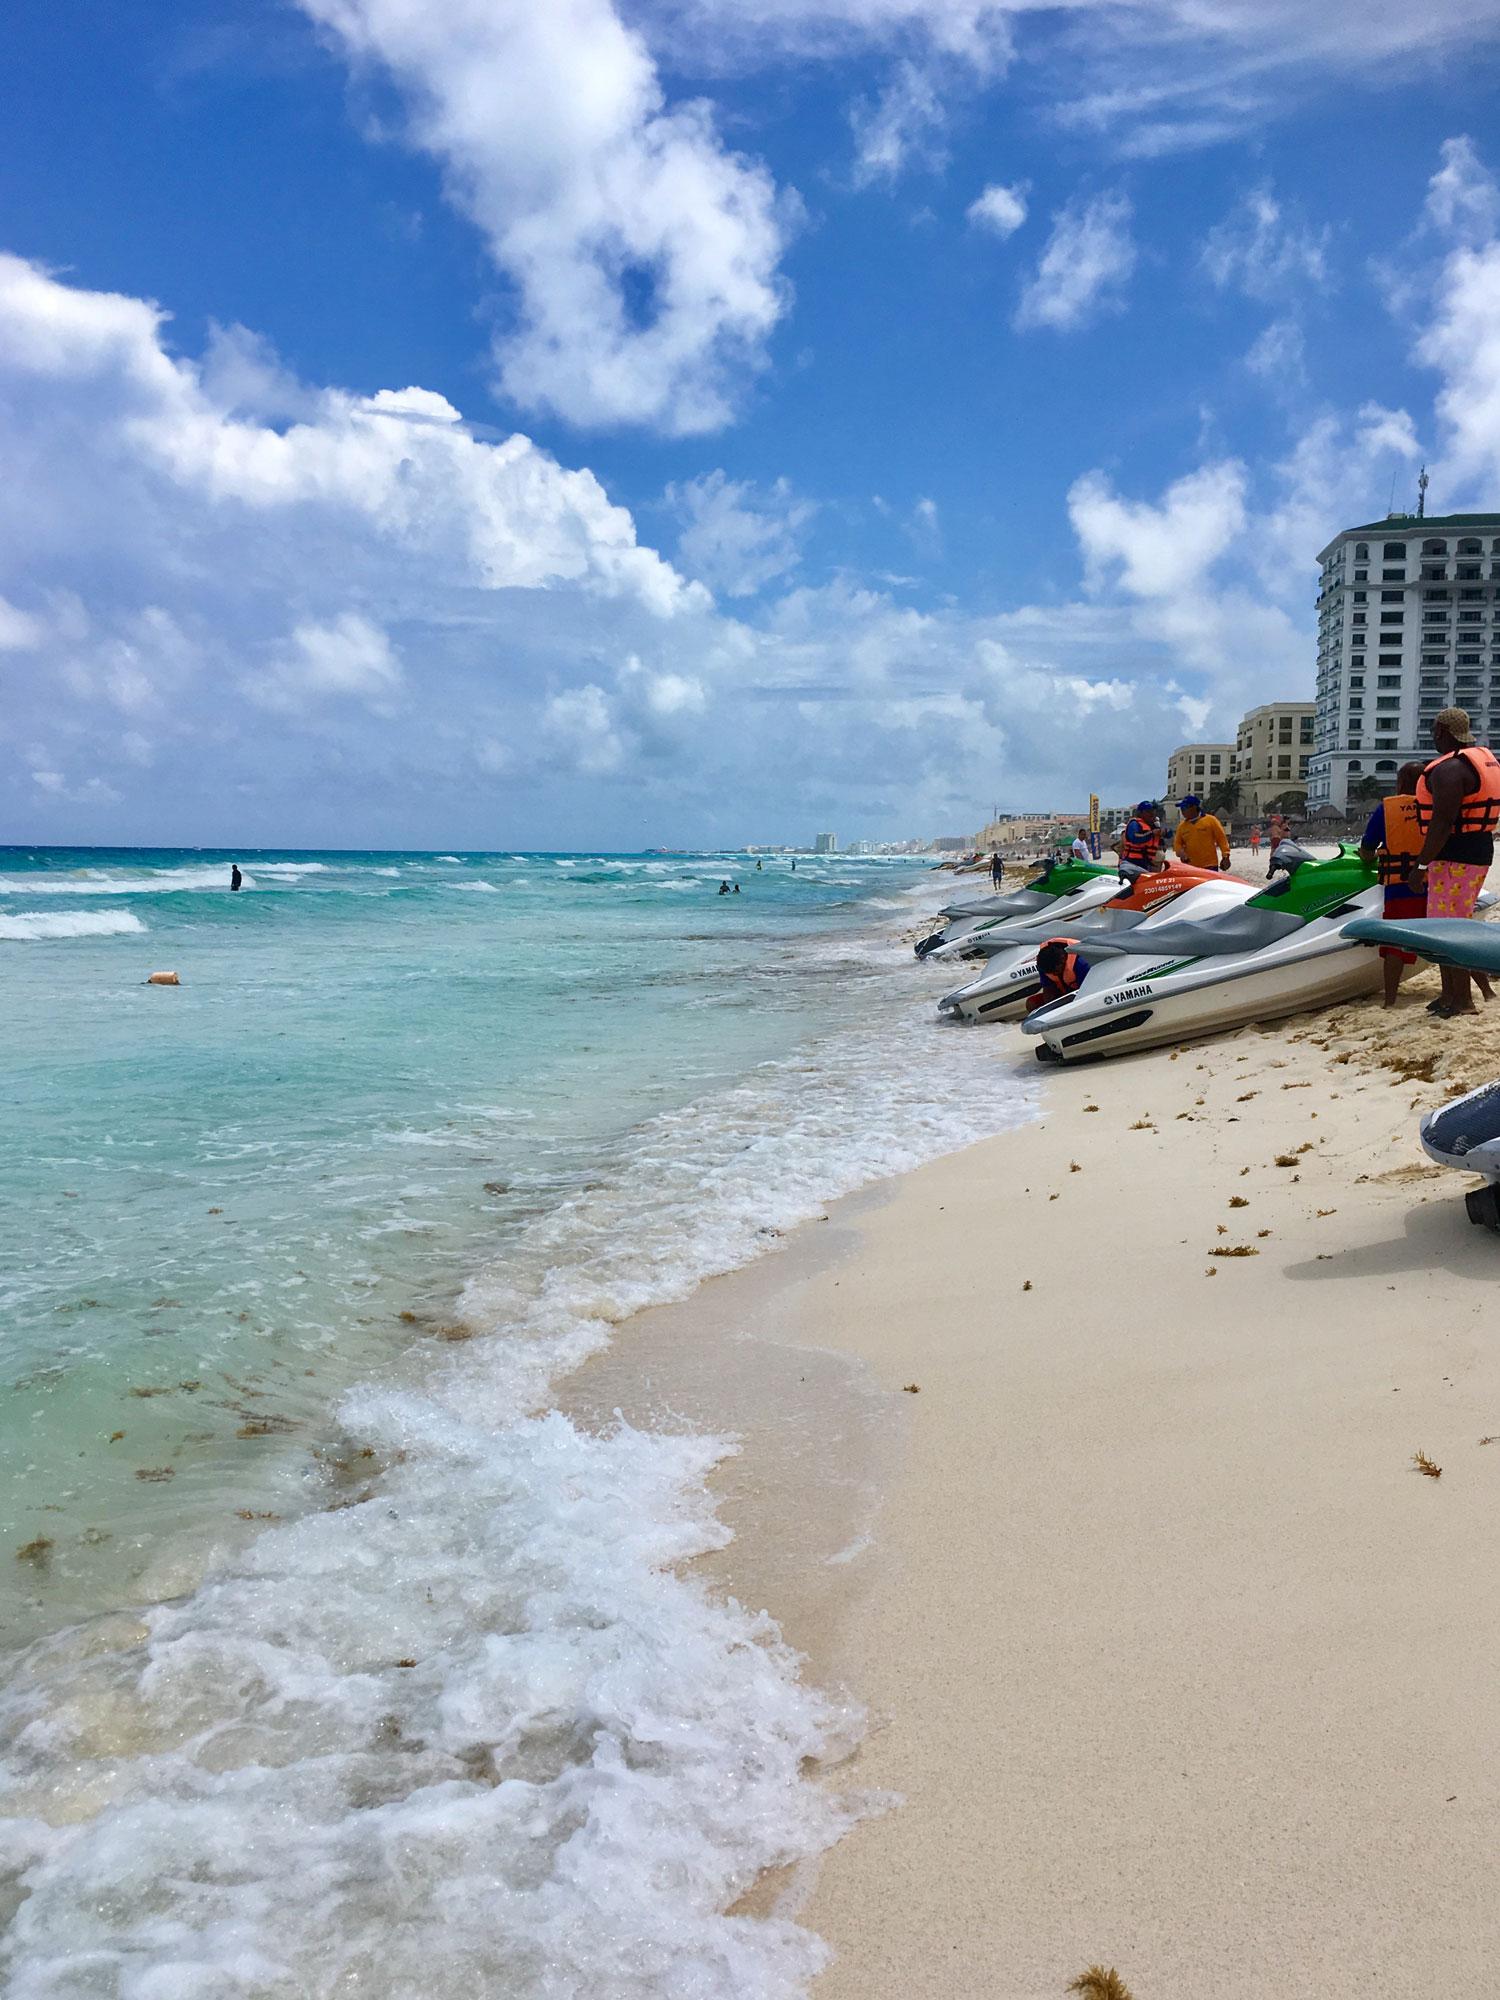 Hammocks_and_Ruins_Riviera_Maya_Mexico_Explore_What_to_Do_Yucatan_Cancun_Beaches_Playa_Ballenas_10.jpg